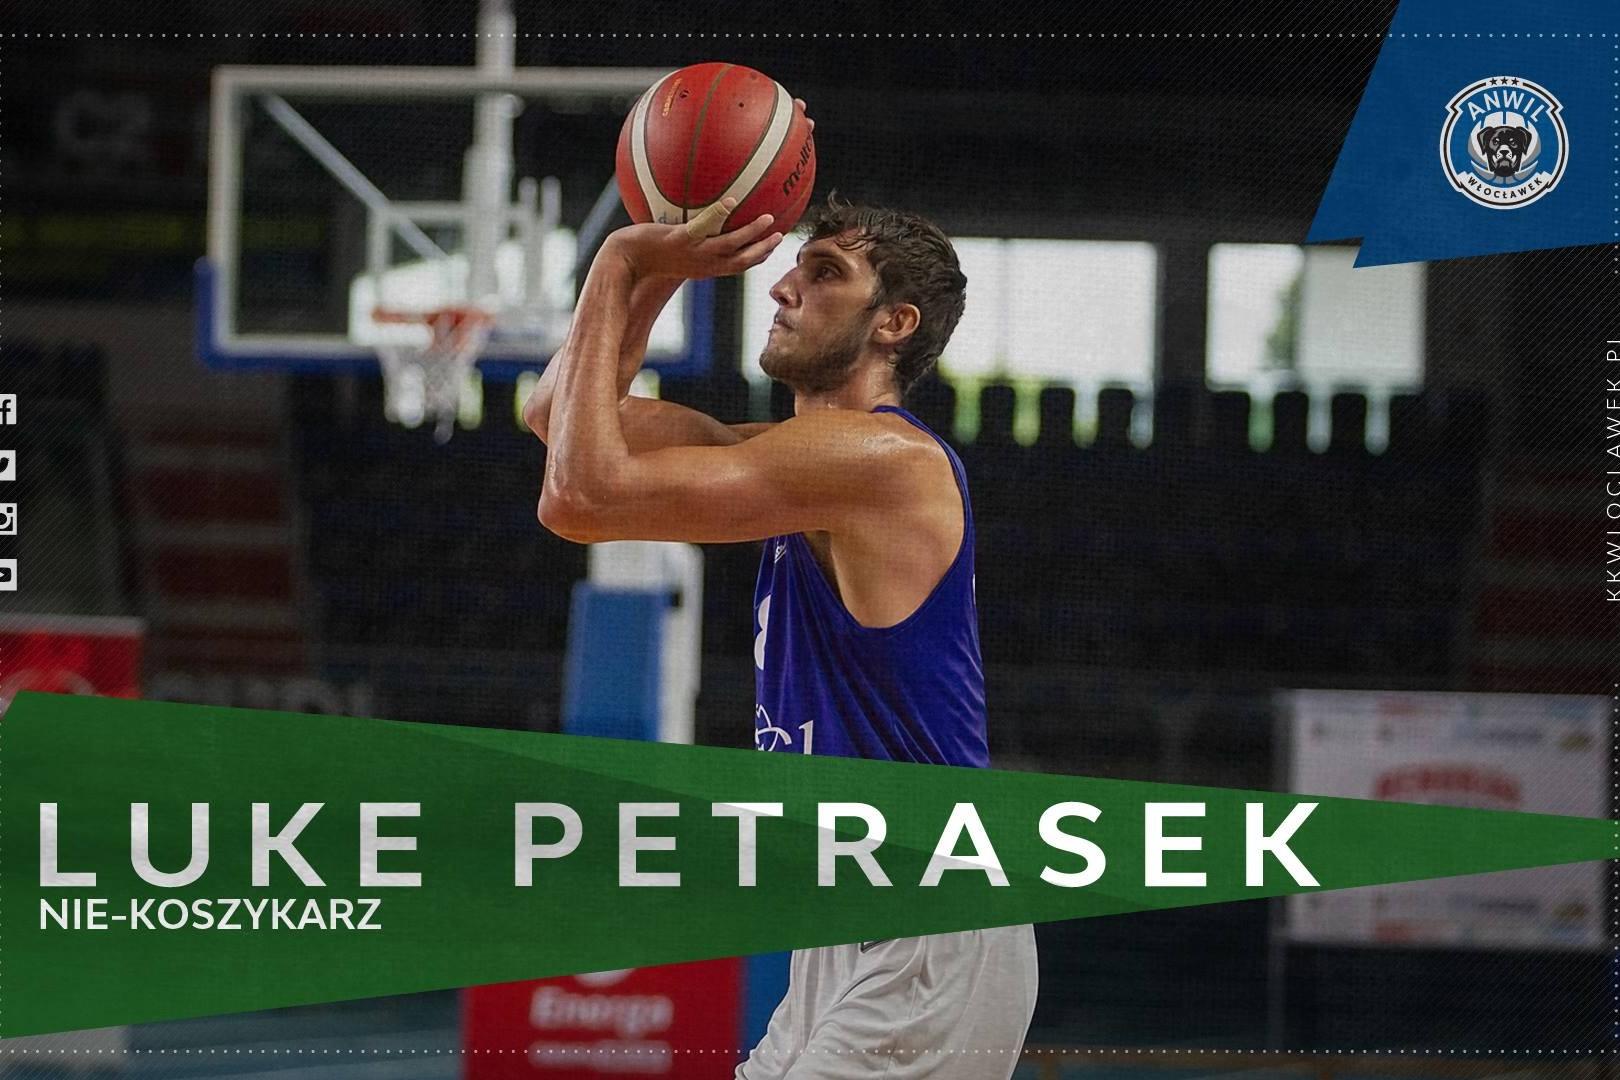 (Nie)Koszykarz: Luke Petrasek